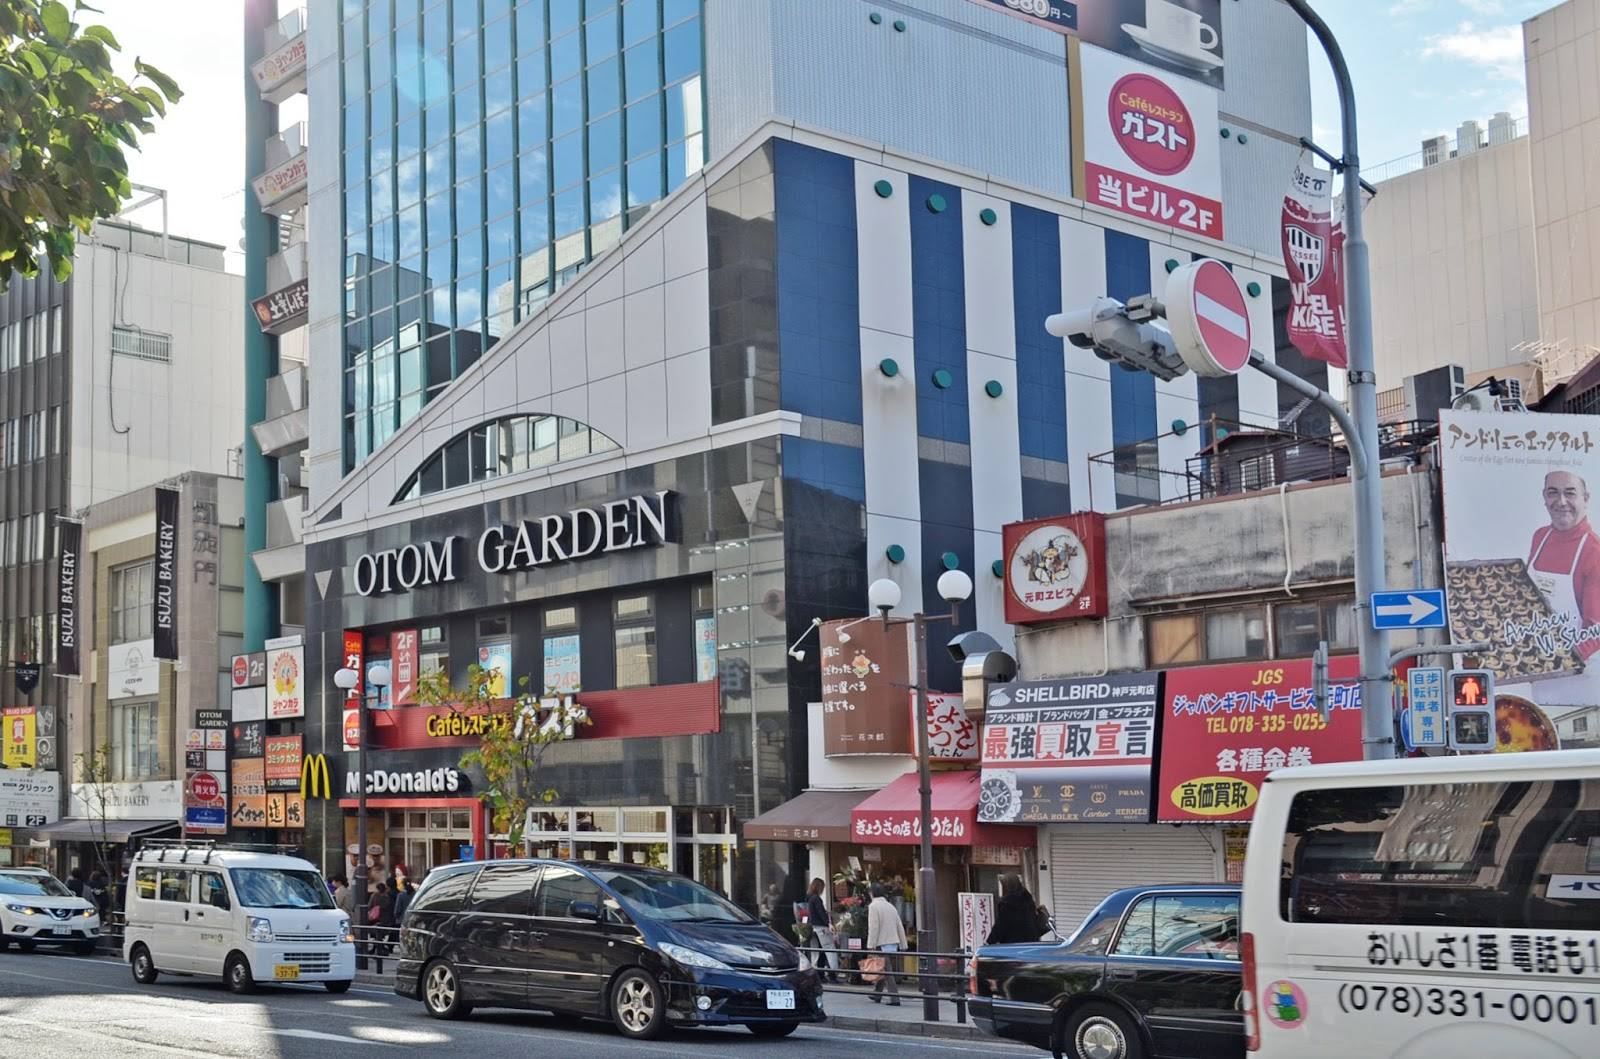 Japan 2016] Kobe: Nankinmachi / Kobe Chinatown + Motomachi